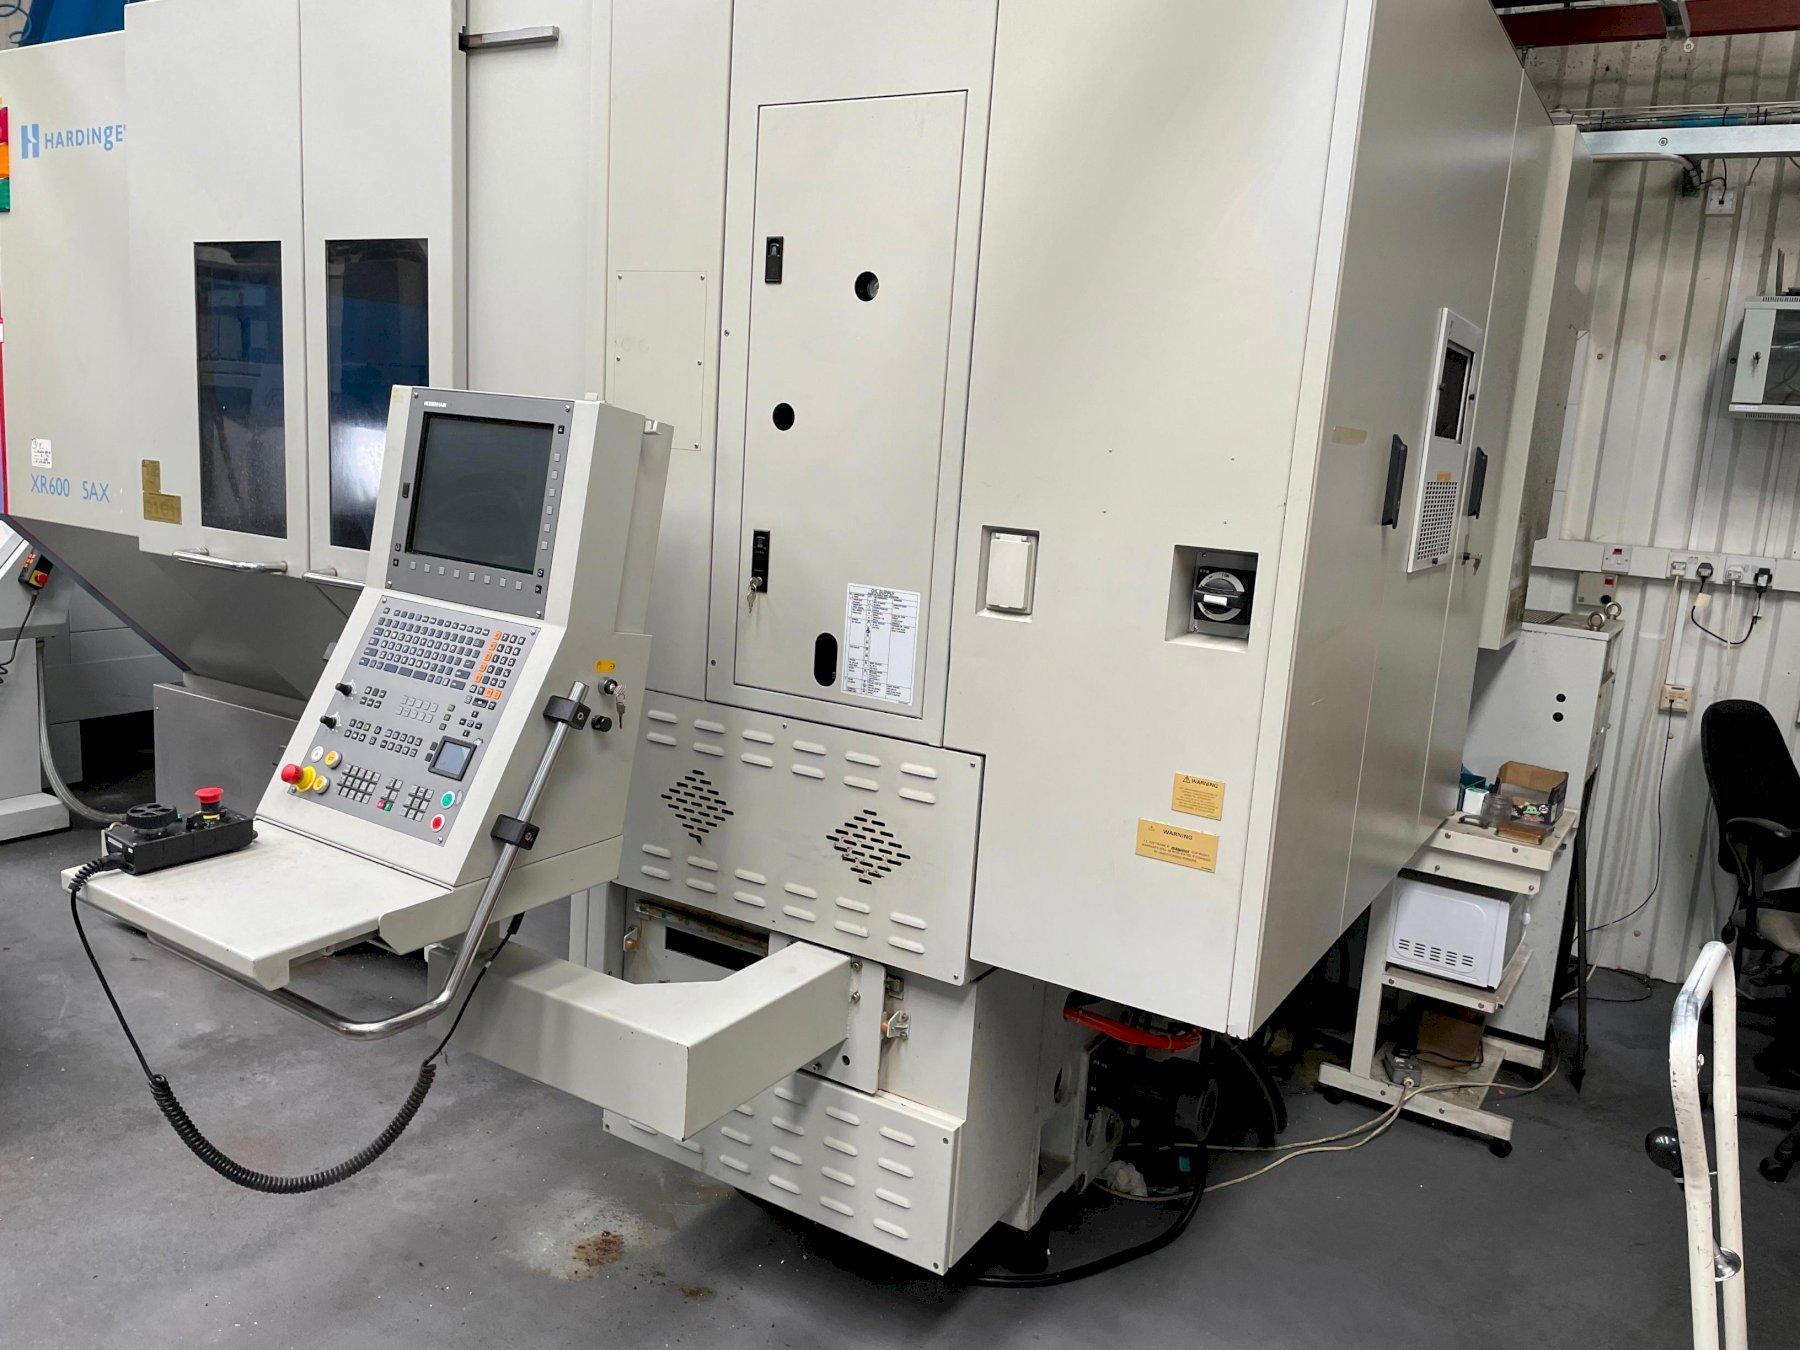 Hardinge Bridgeport XR 600-5AX Vertical Machining Centre